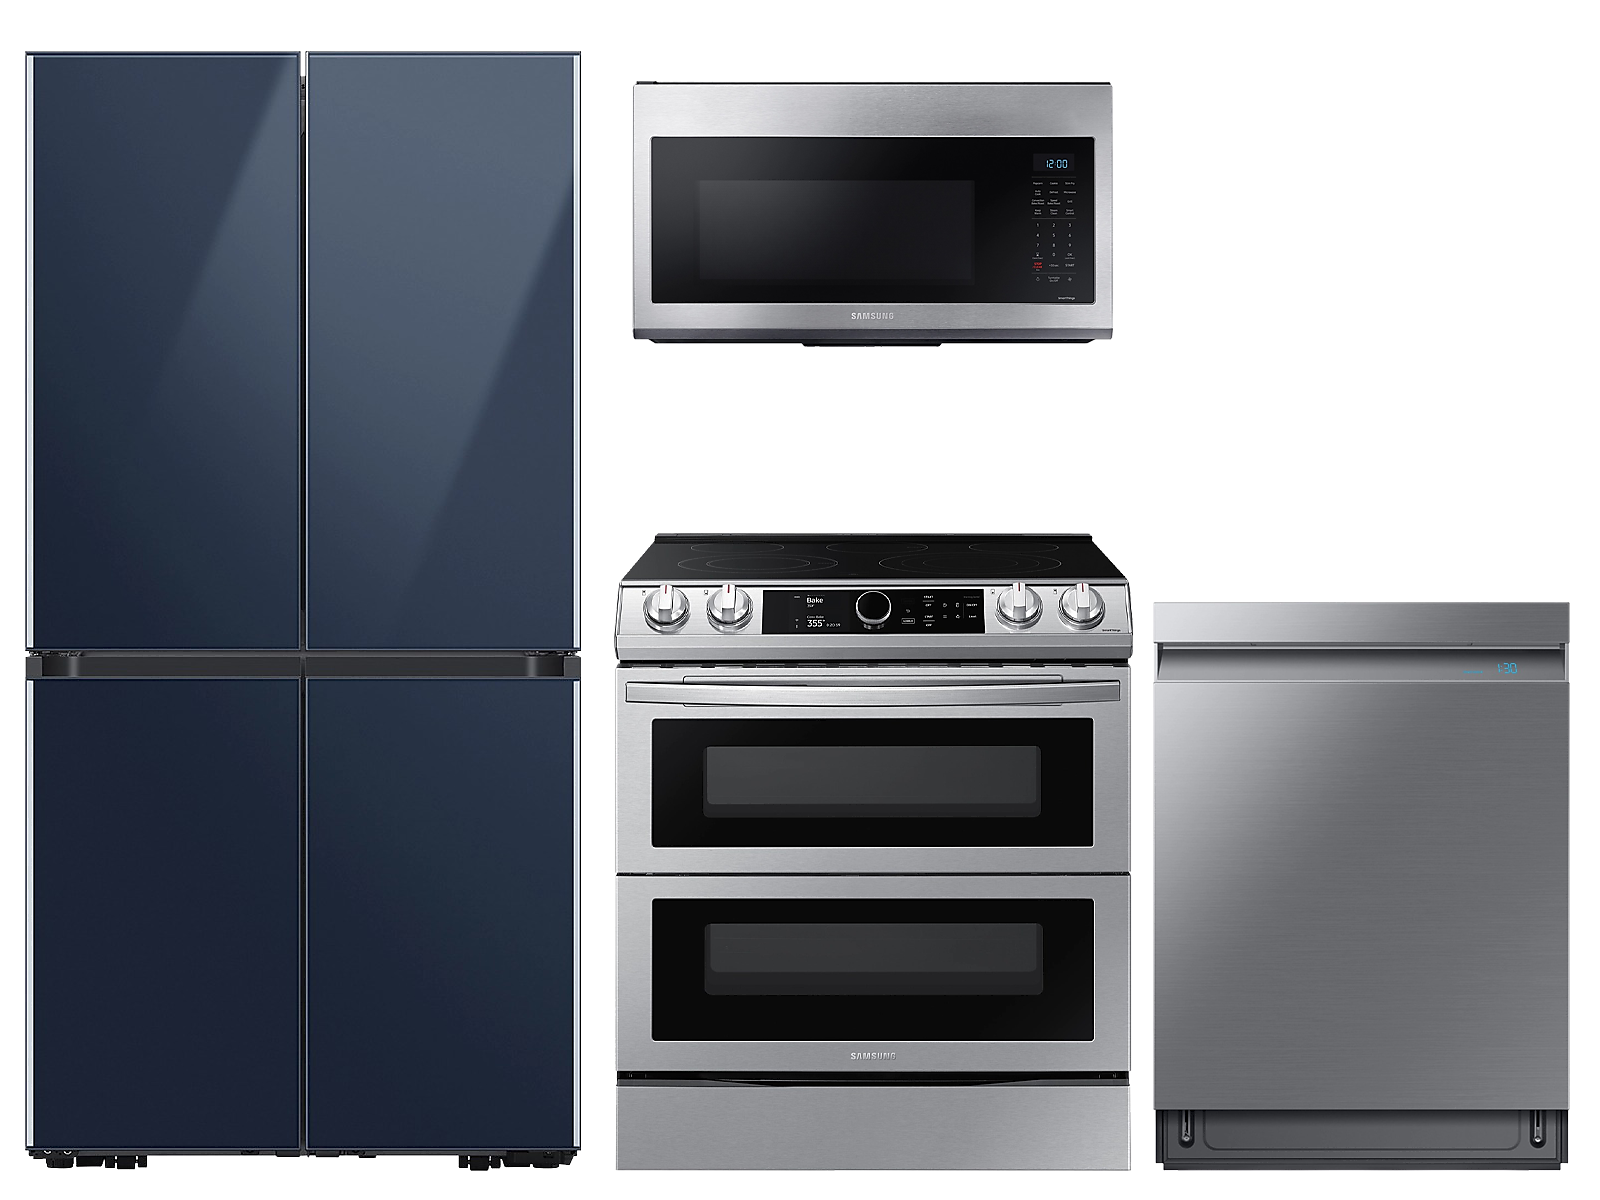 Samsung coupon: Samsung 23 cu. ft. Counter Depth BESPOKE 4-Door FlexTM Refrigerator in Navy Blue Glass